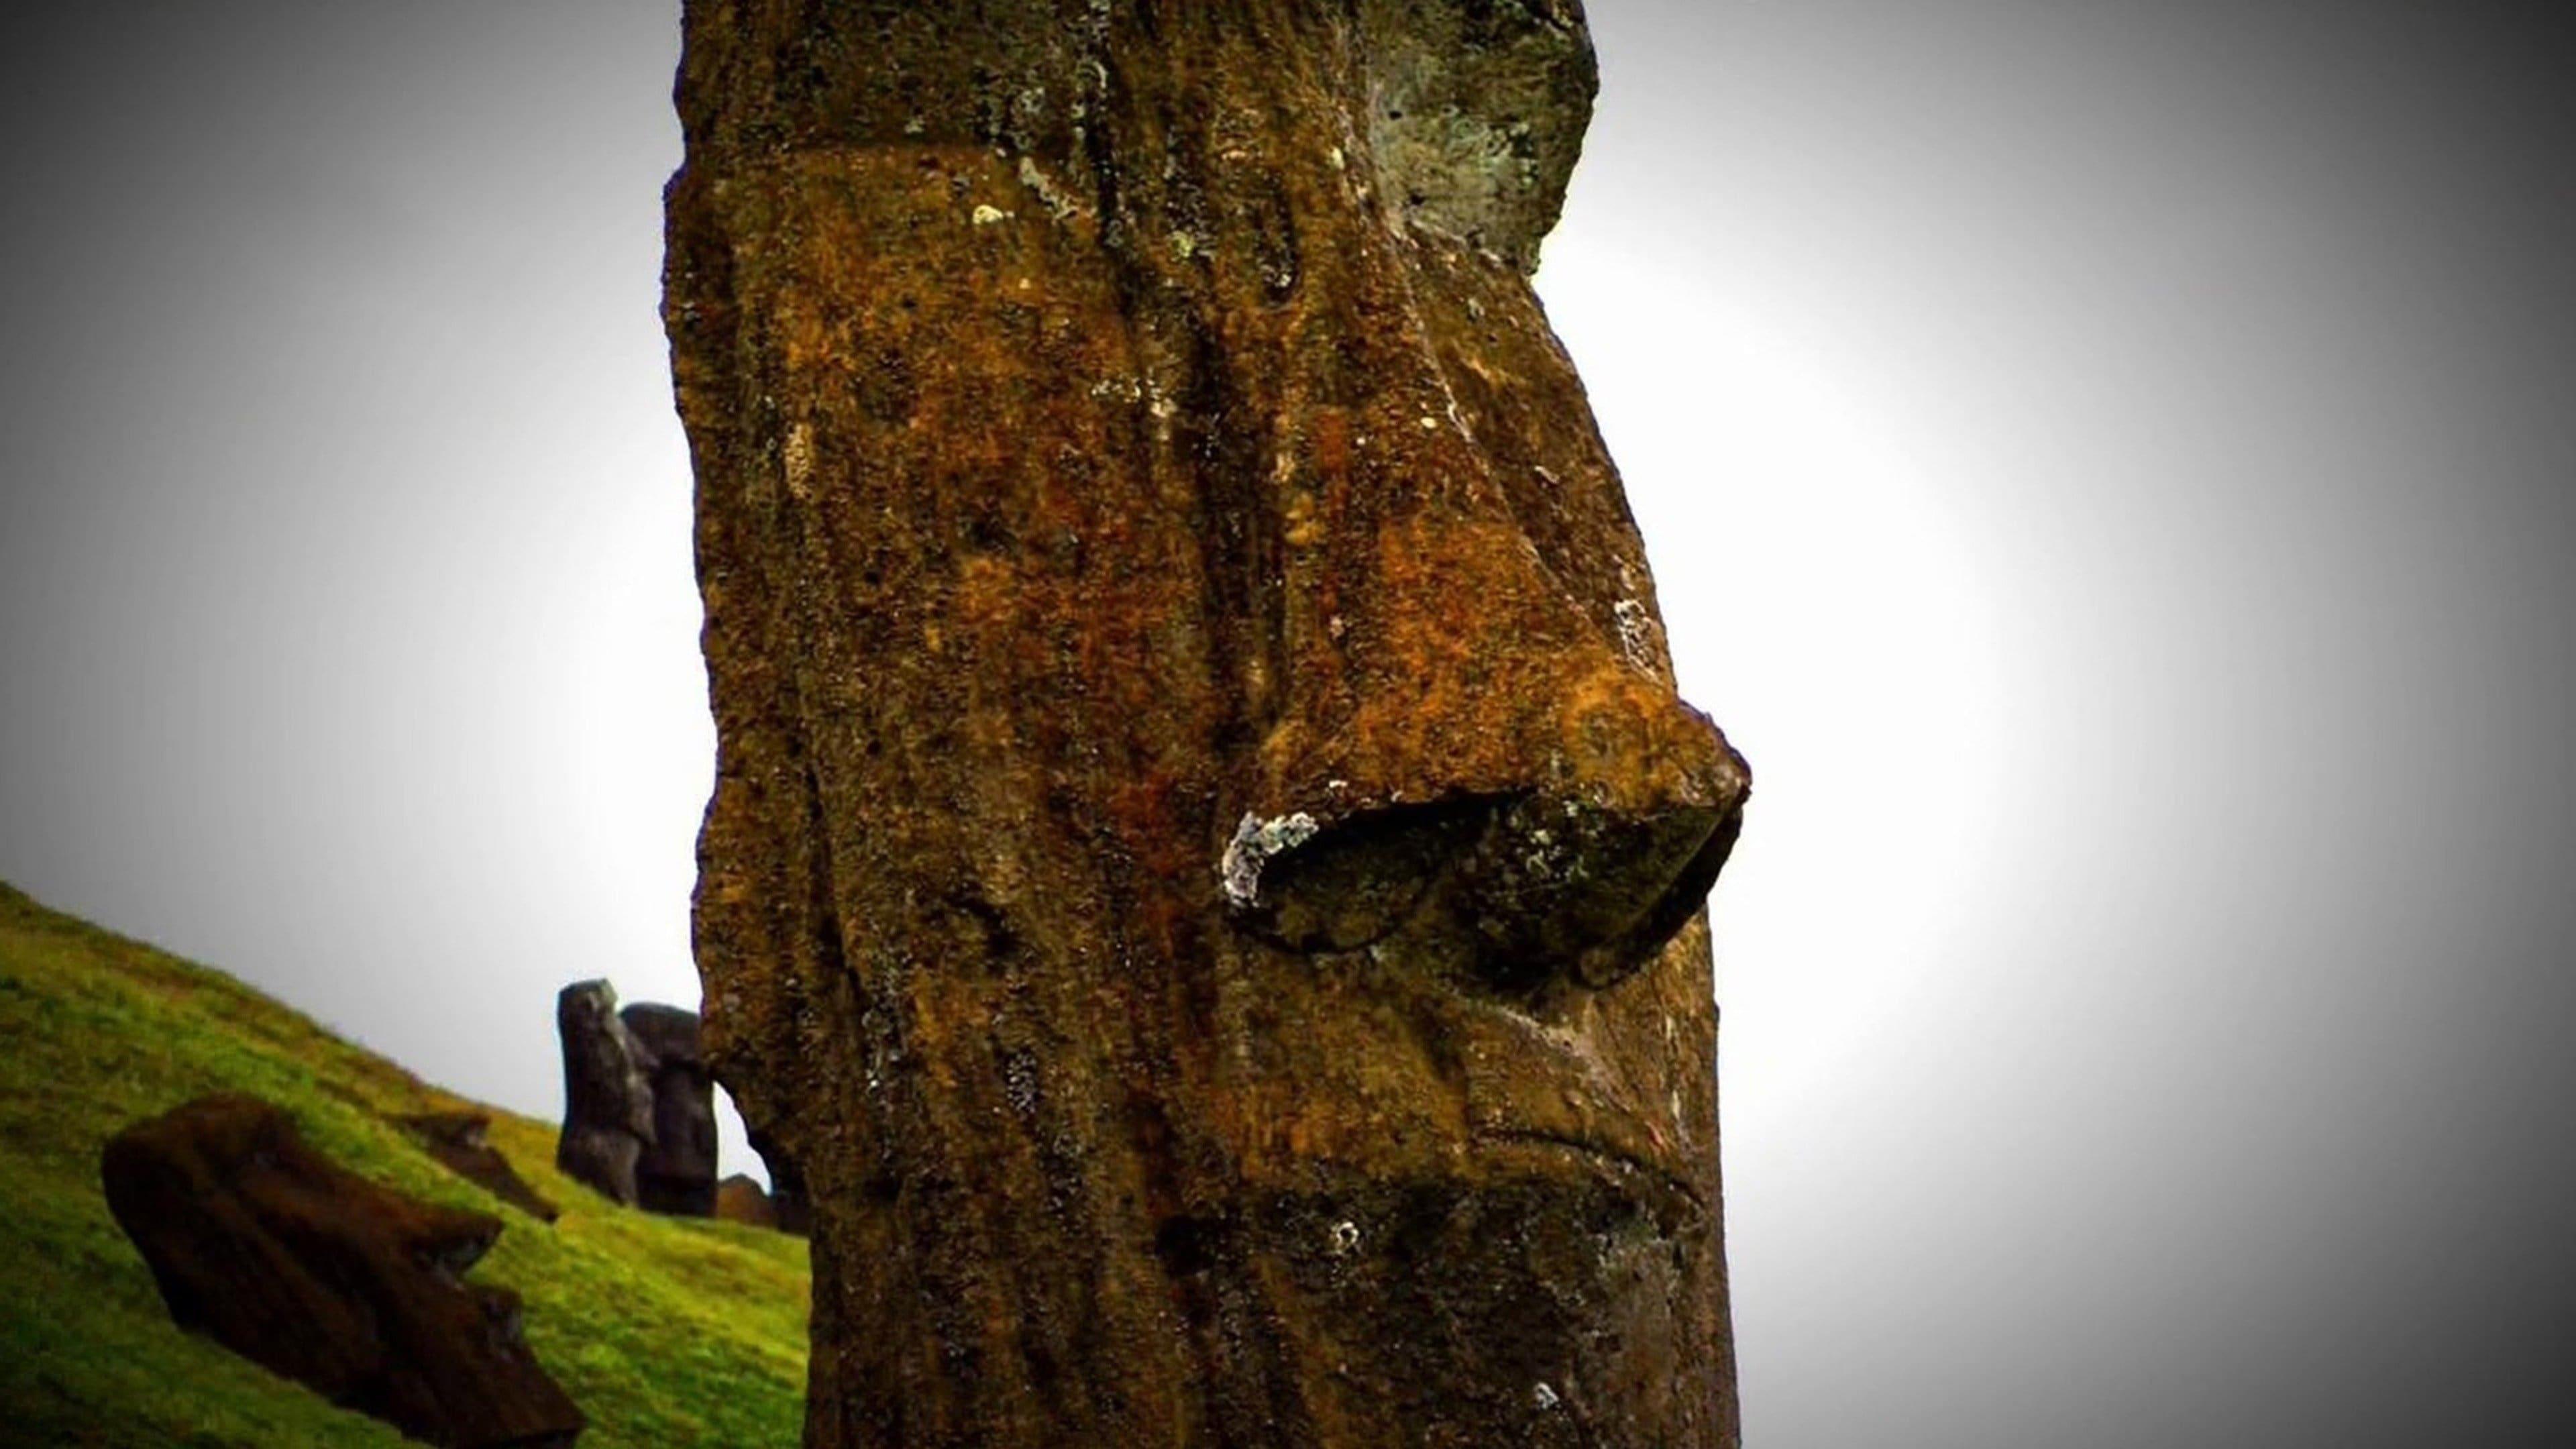 The Monoliths